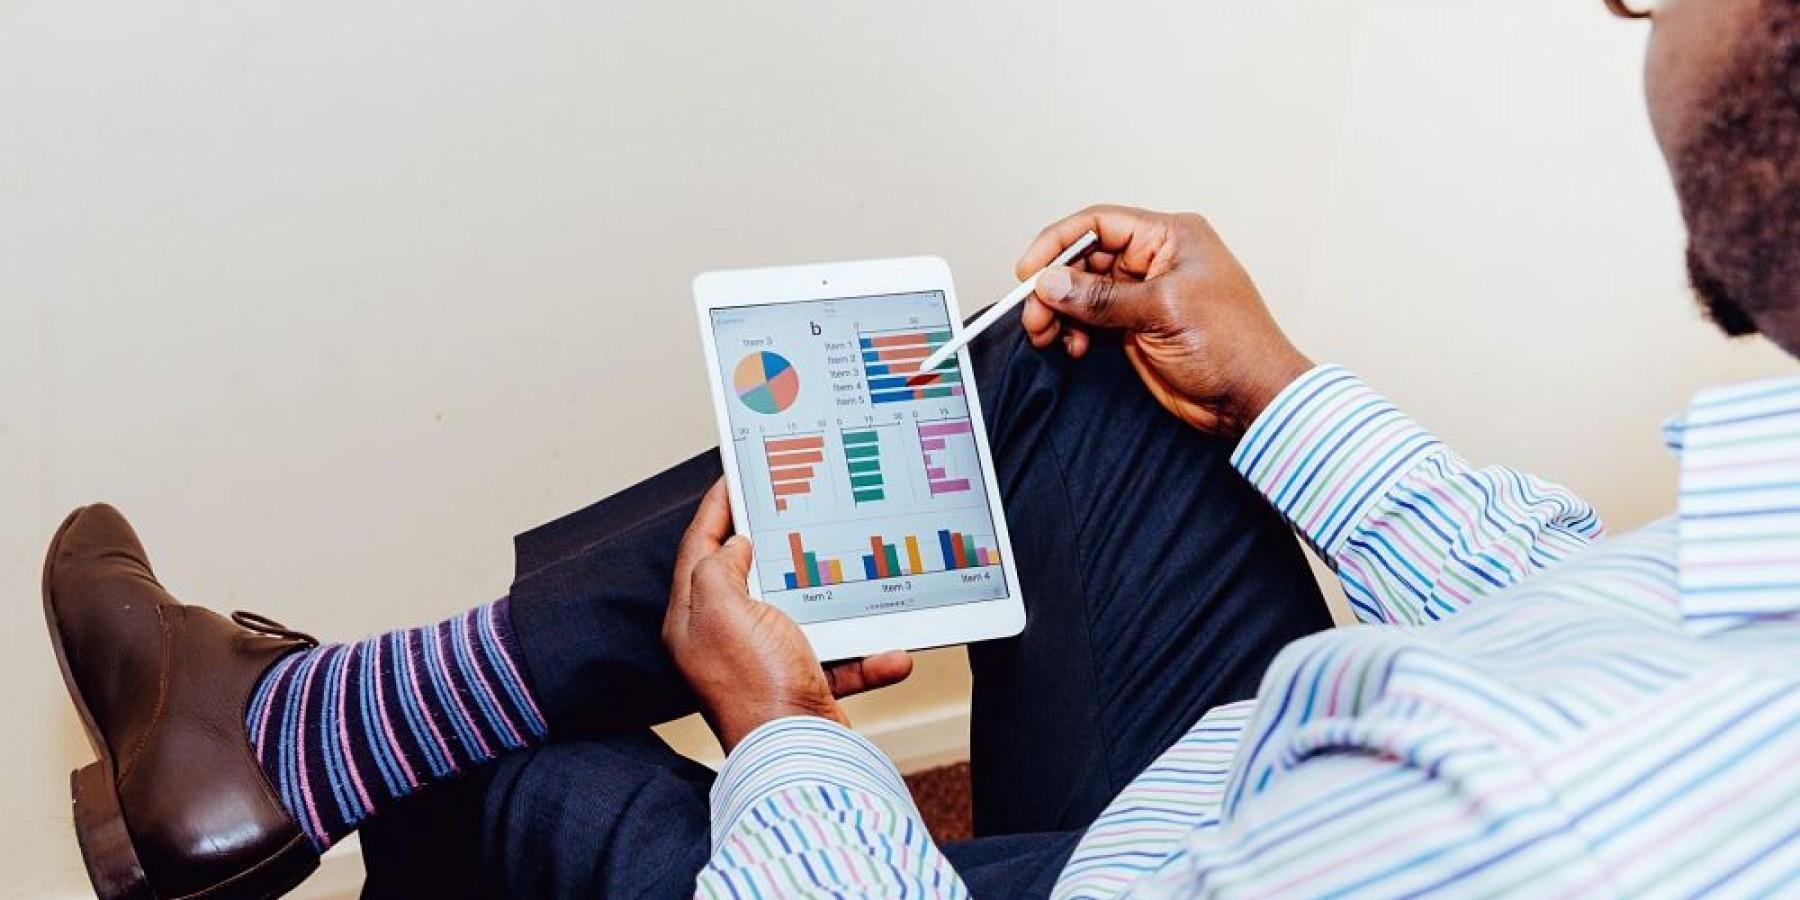 3 segmentos de Google Analytics que todo principiante debe conocer